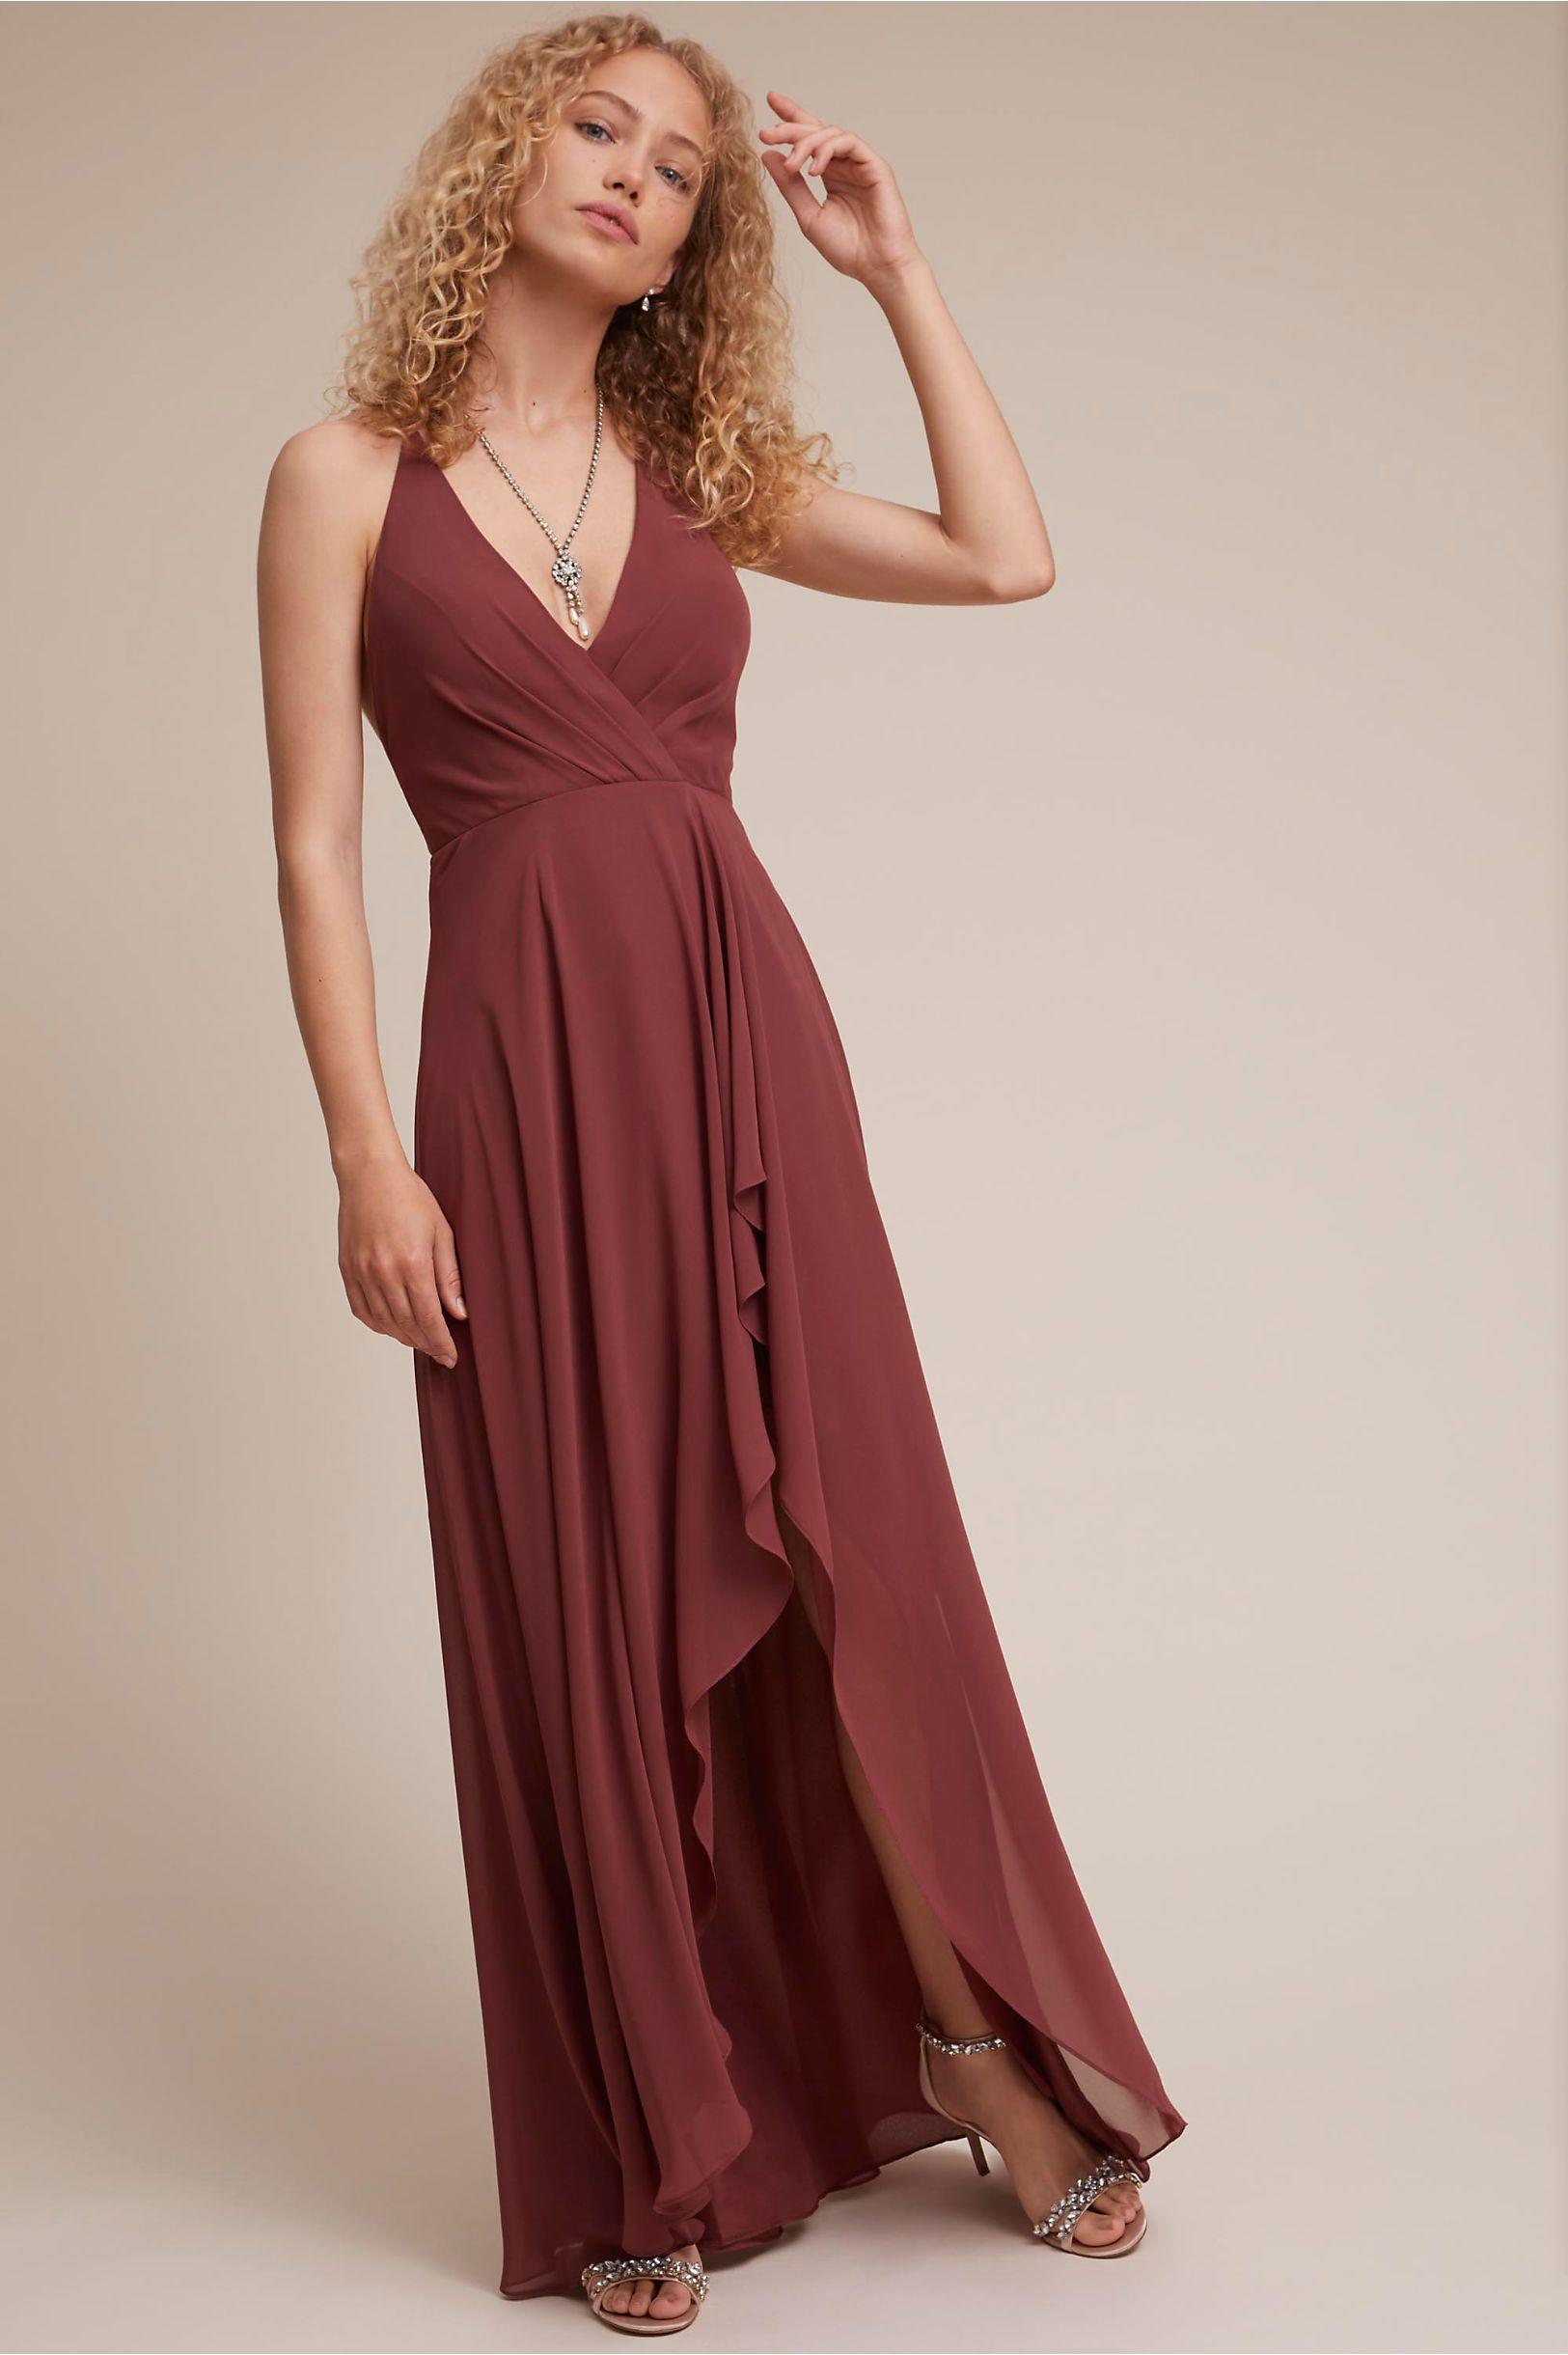 a31b0f229d BHLDN s Jenny Yoo Farrah Dress in Cinnamon Rose